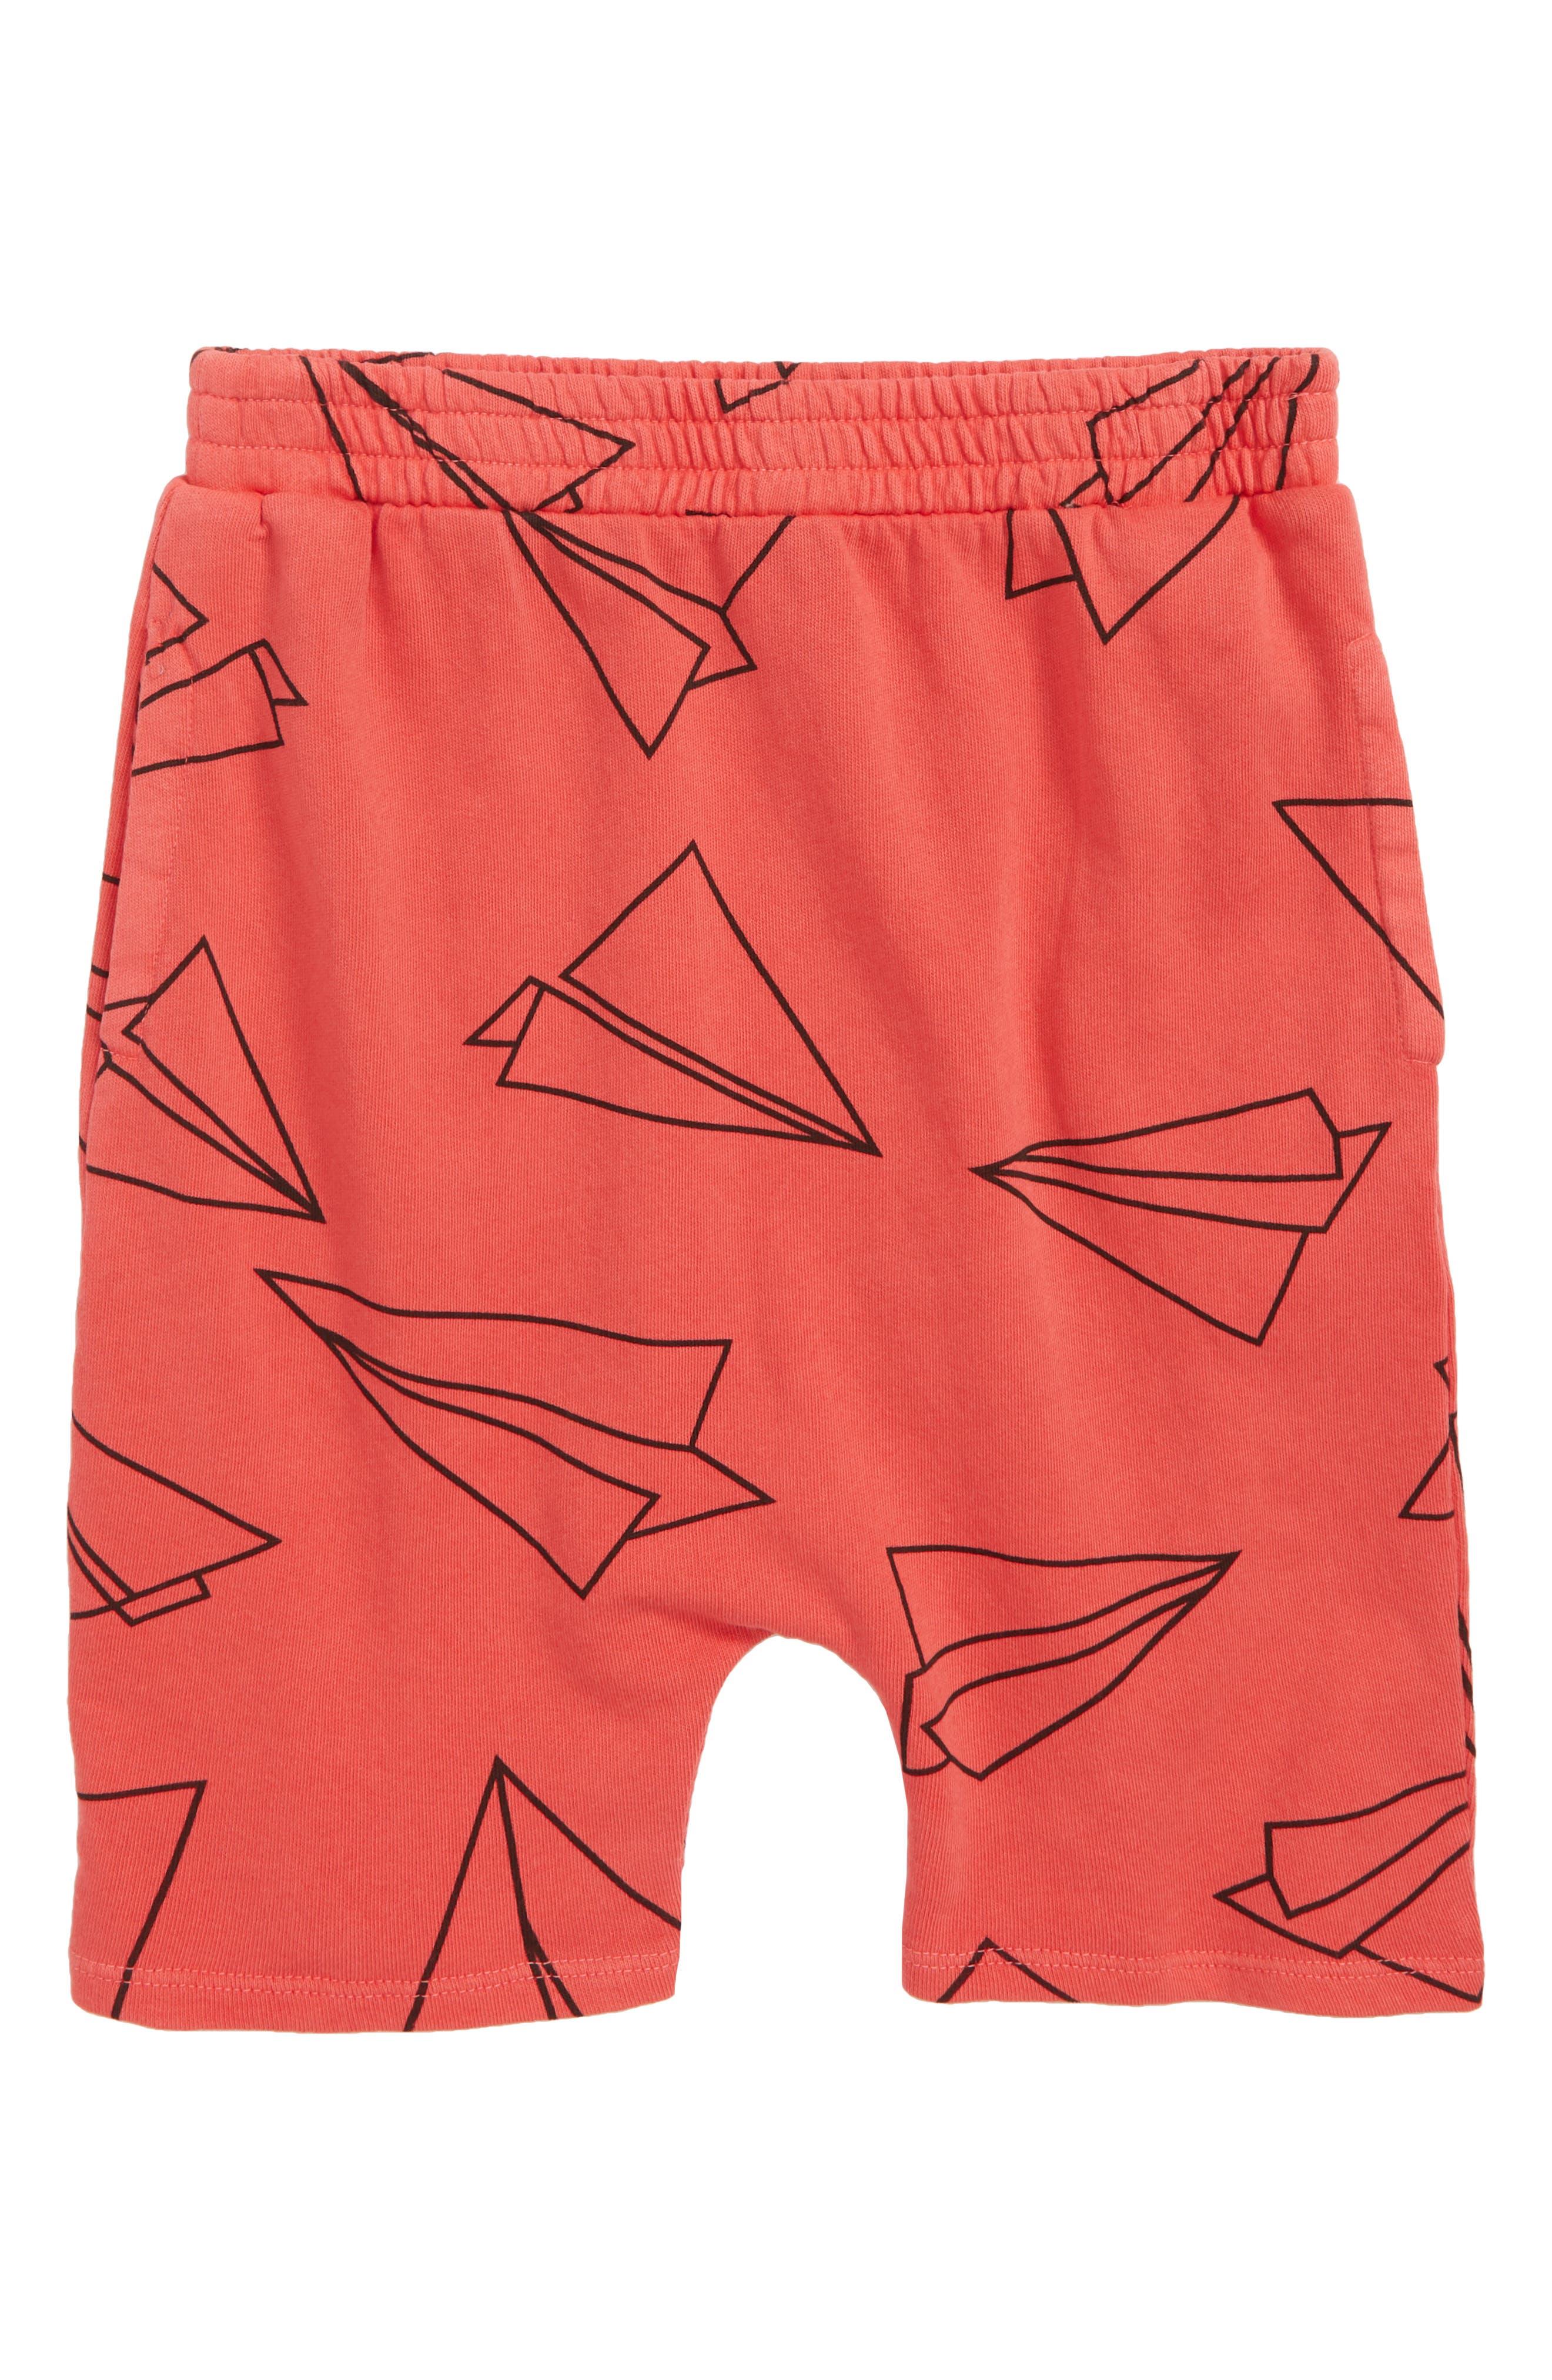 Stem Print Shorts (Toddler Boys, Little Boys & Big Boys)